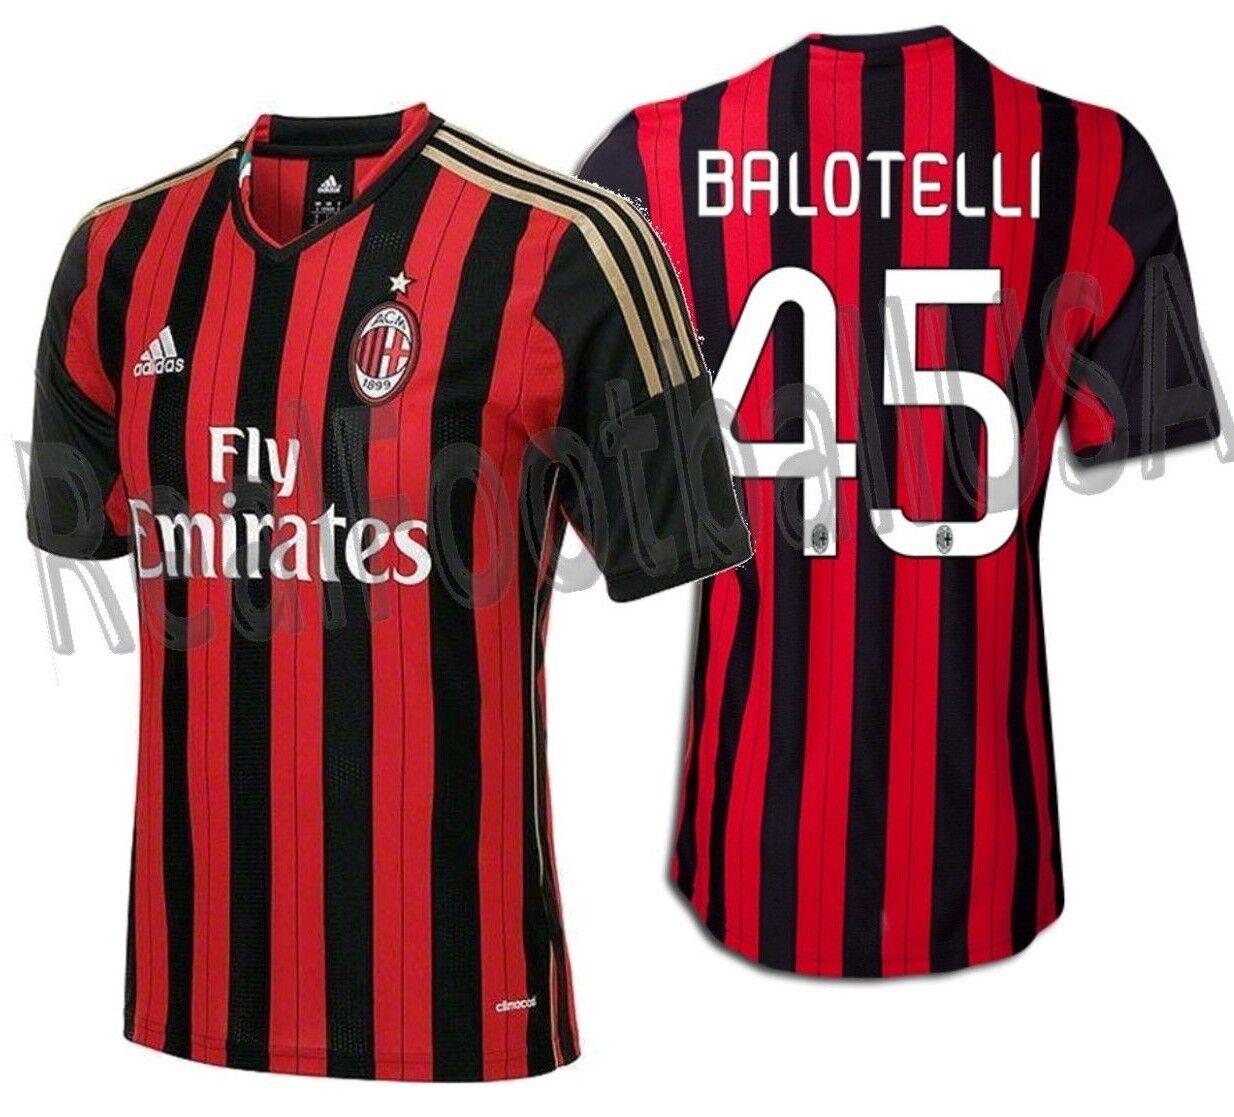 Adidas Mario Balotelli Ac Milan Home Jersey 2013 14